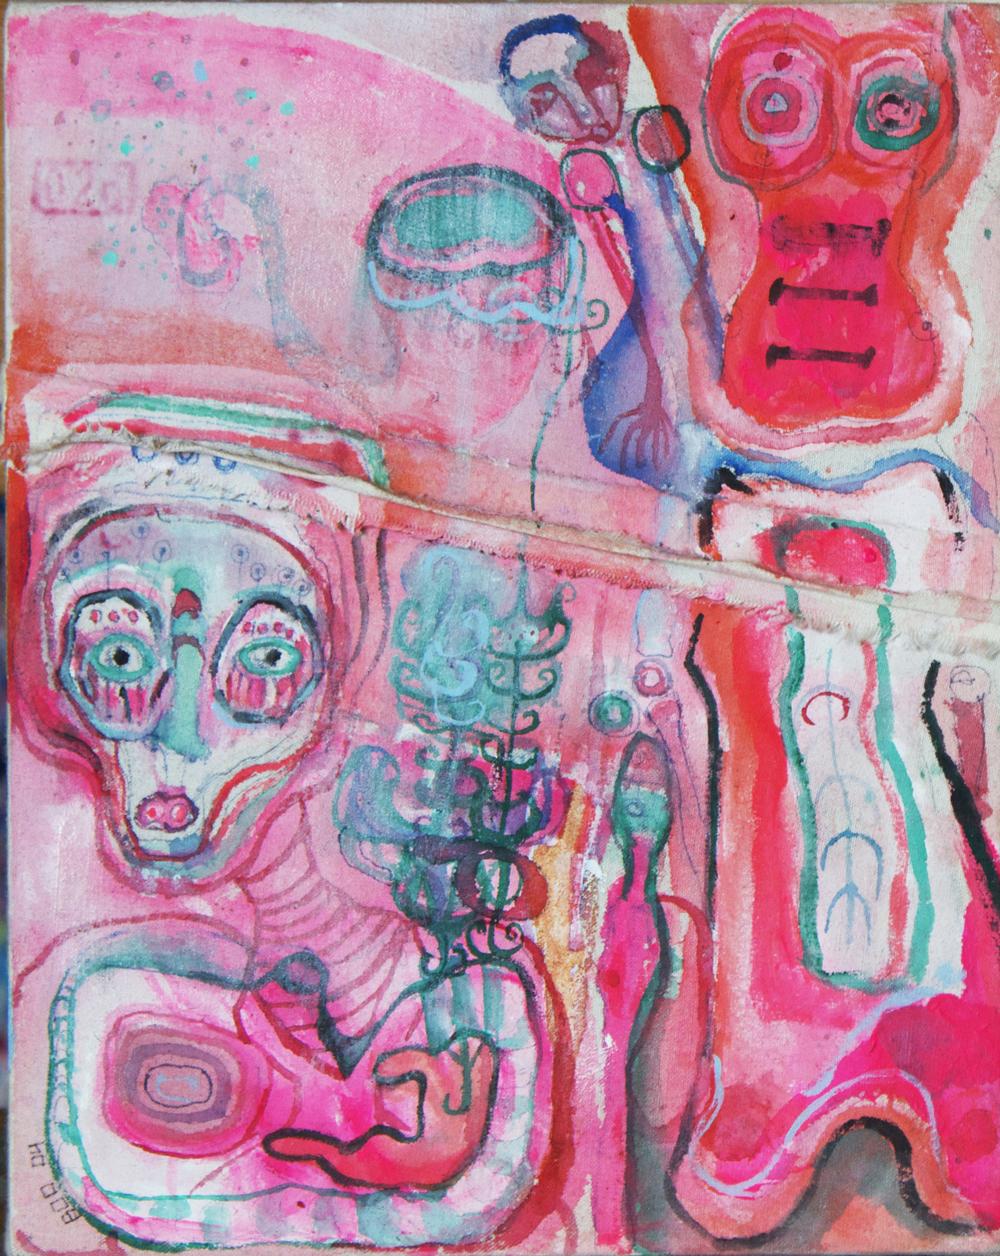 "mini #1, mixed media on canvas, 10x8"", 2004"